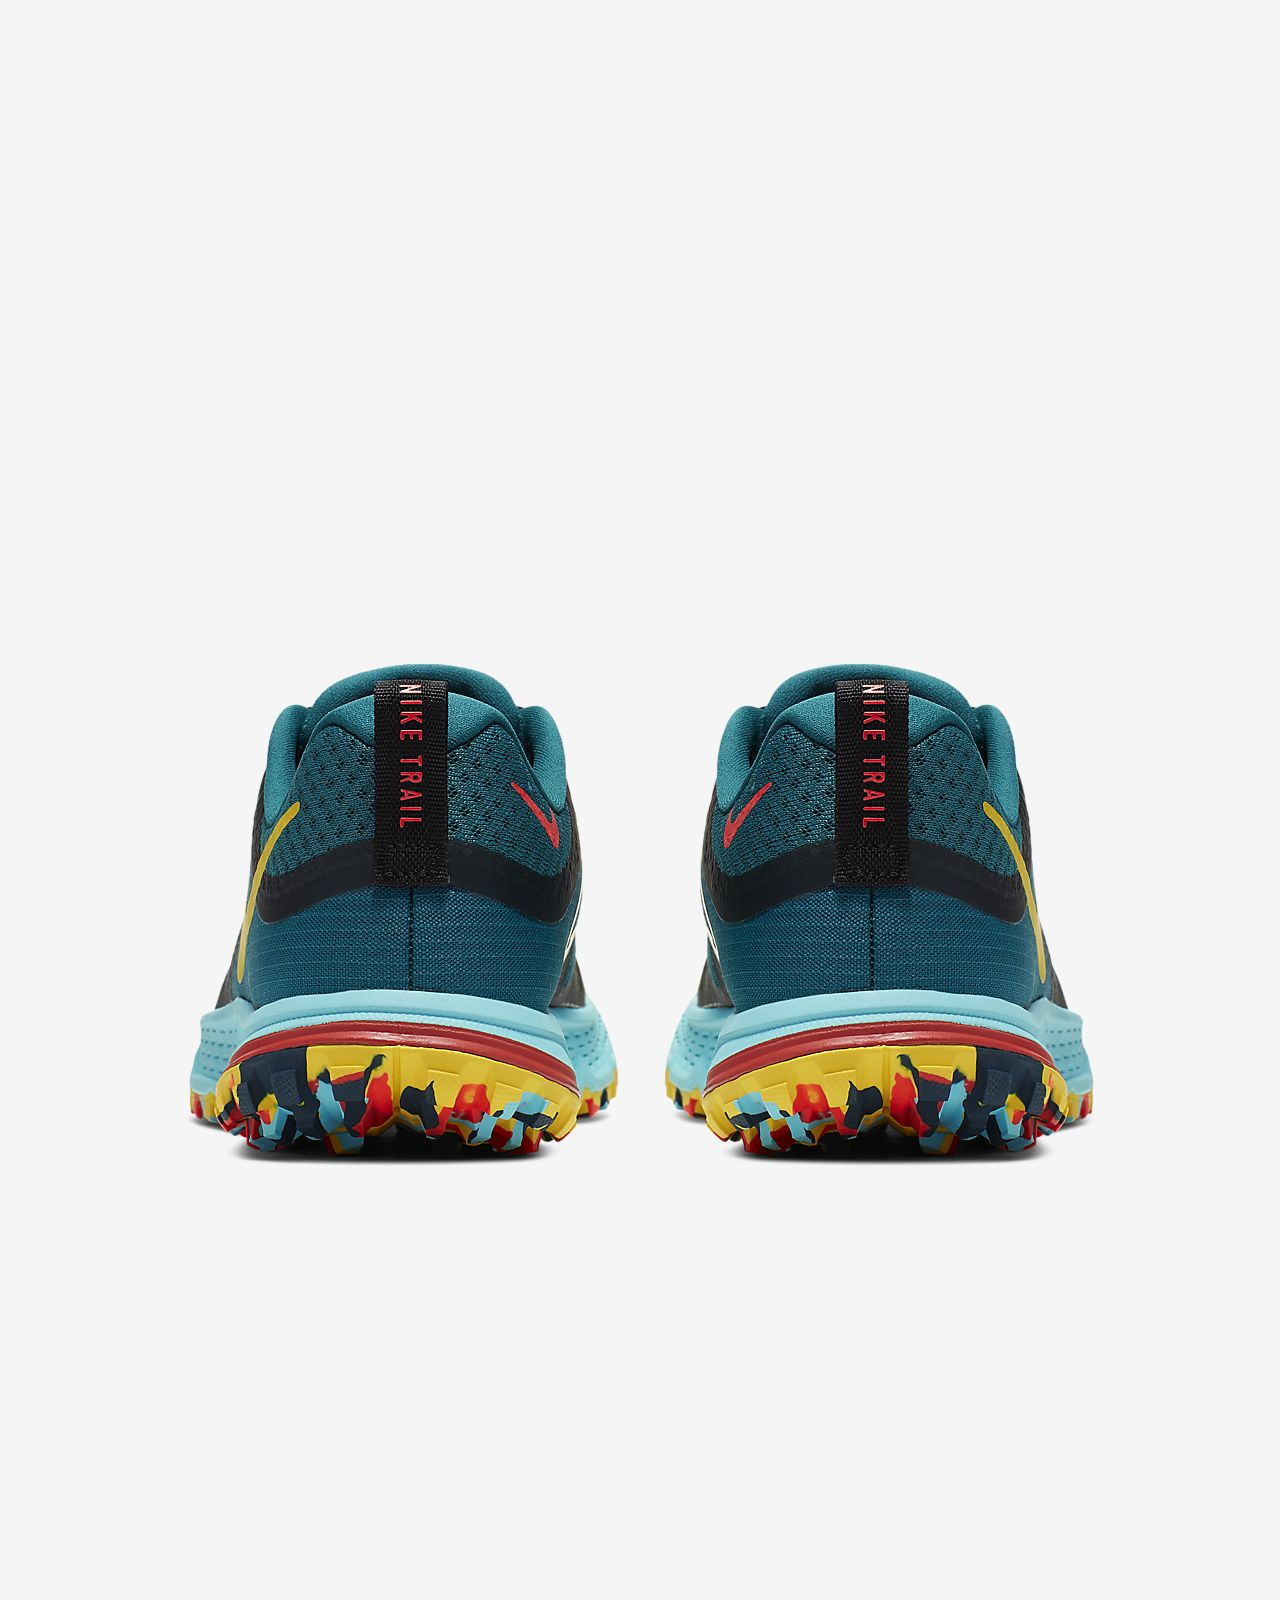 7effe5f18 Nike Air Zoom Wildhorse 5 Women's Running Shoe